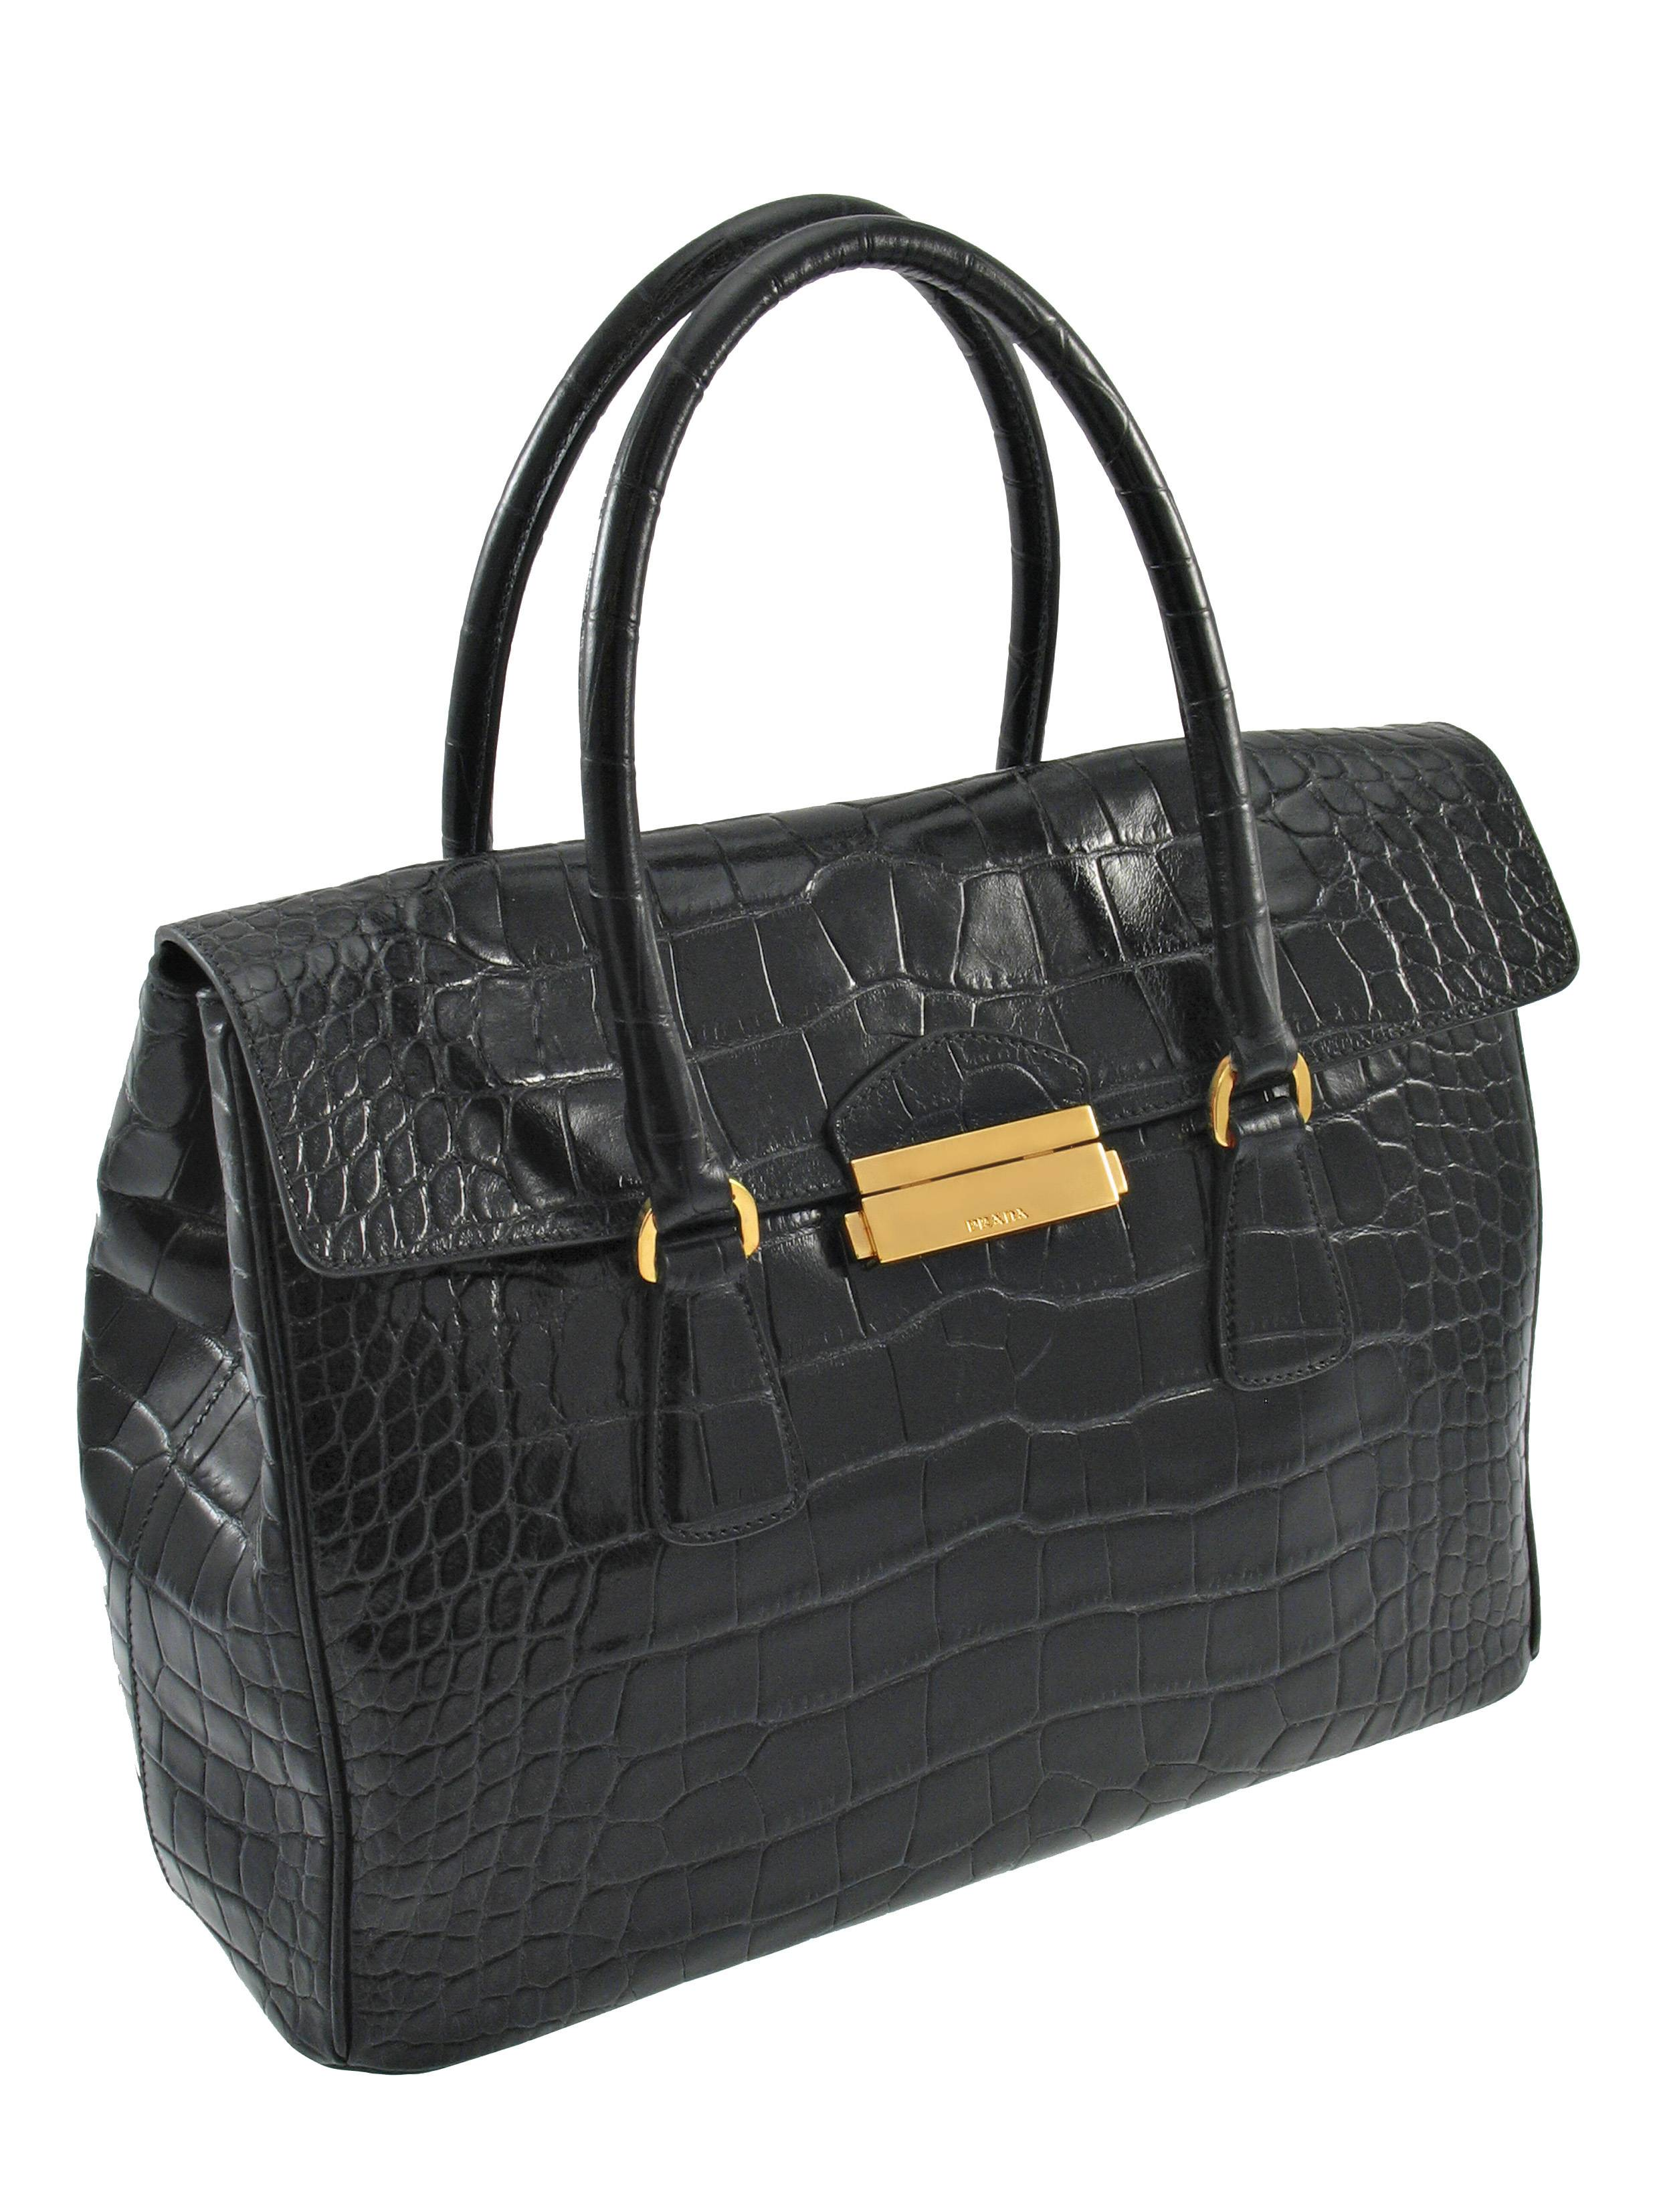 Prada Debuts 40 000 Handbag